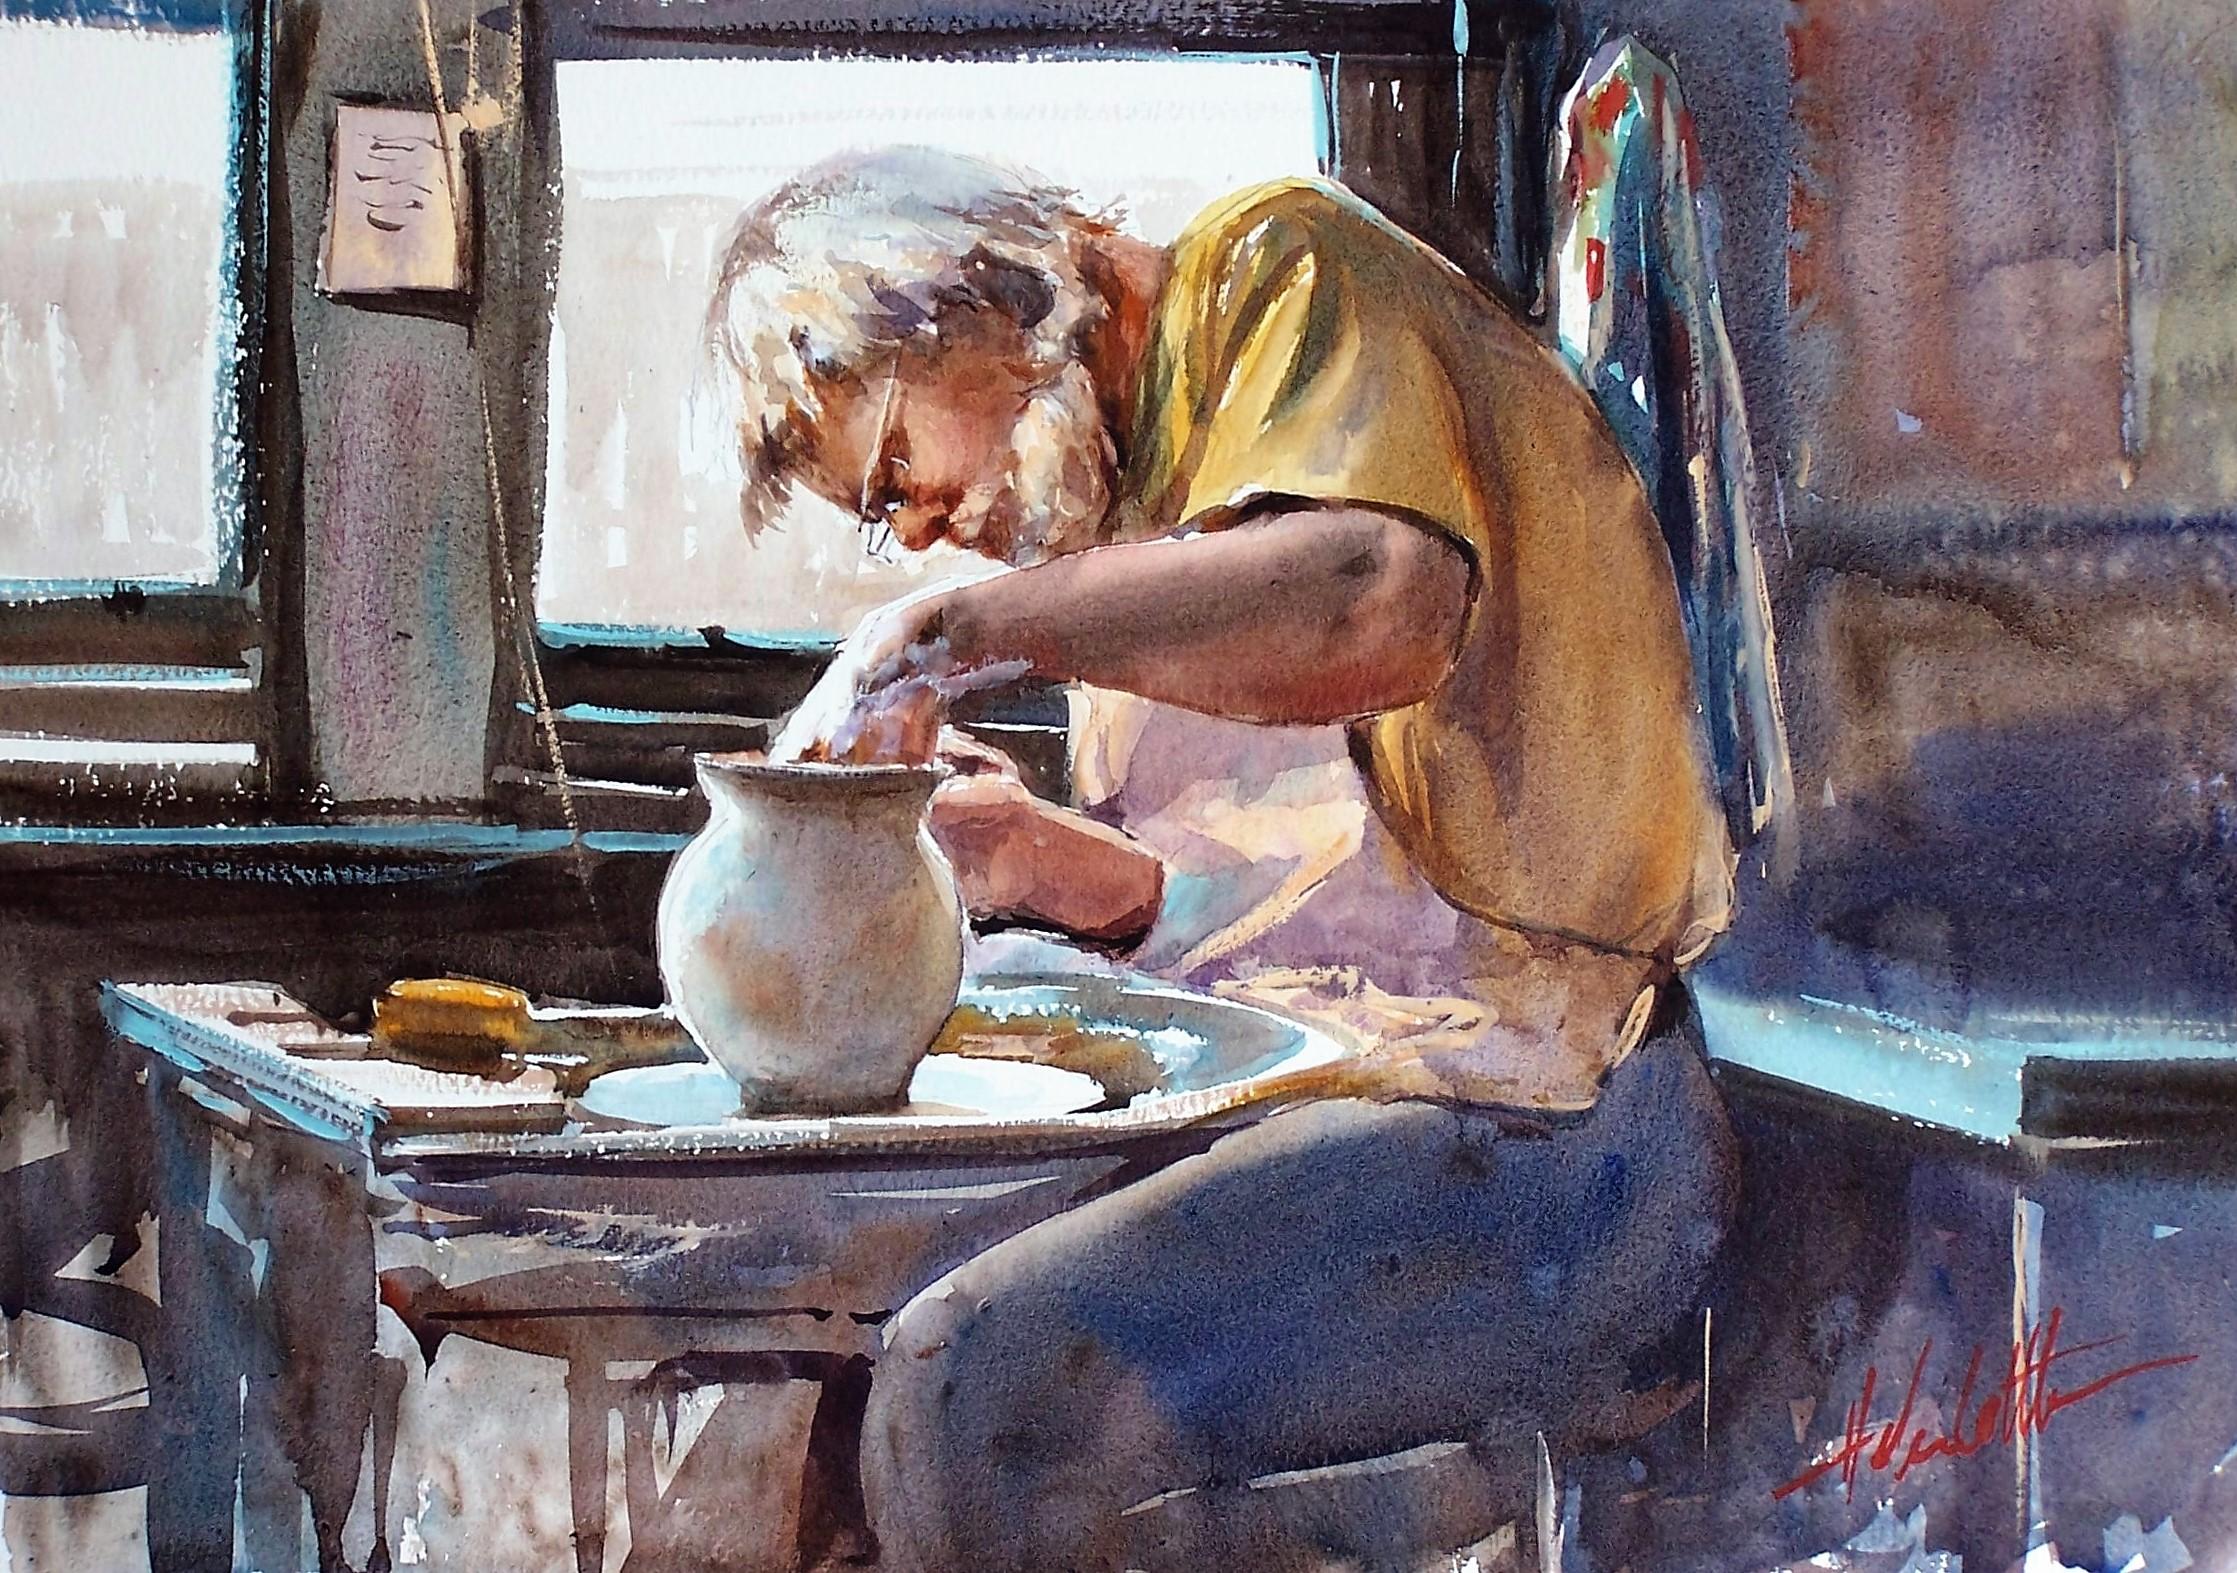 11..November..craftsman at work WC (2).jpg